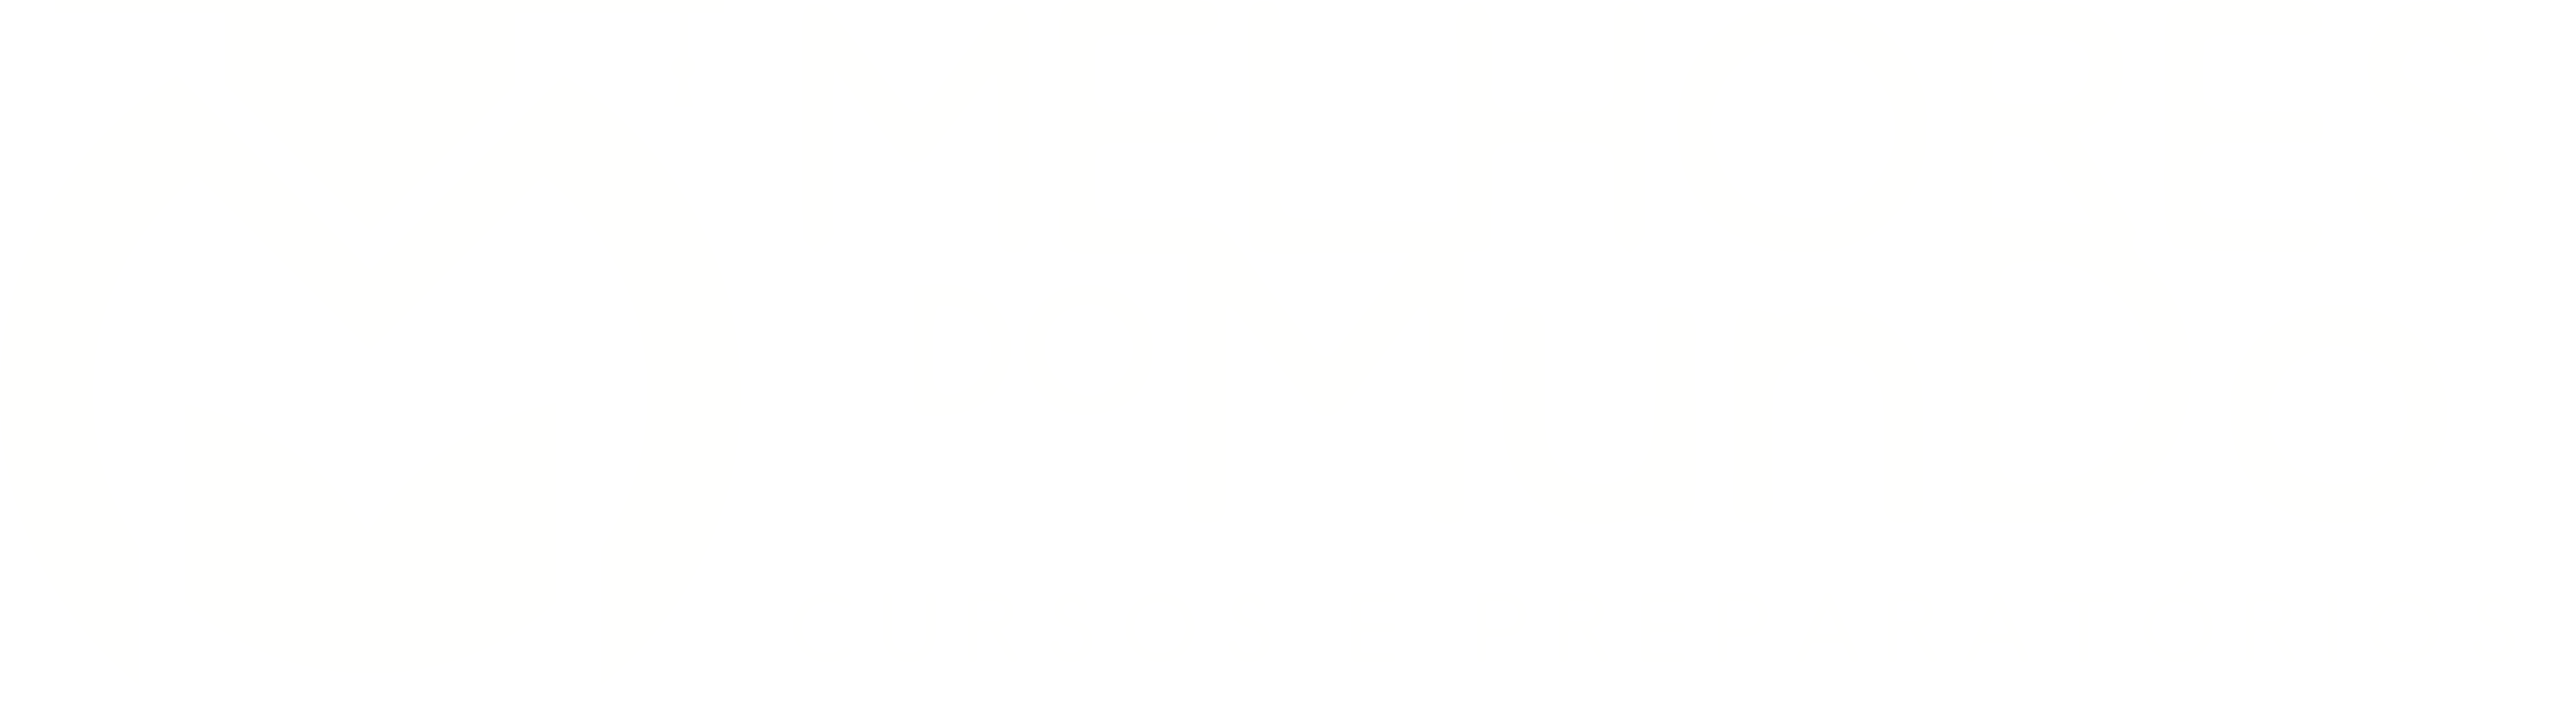 logotipo_horizontal_mdm_branca